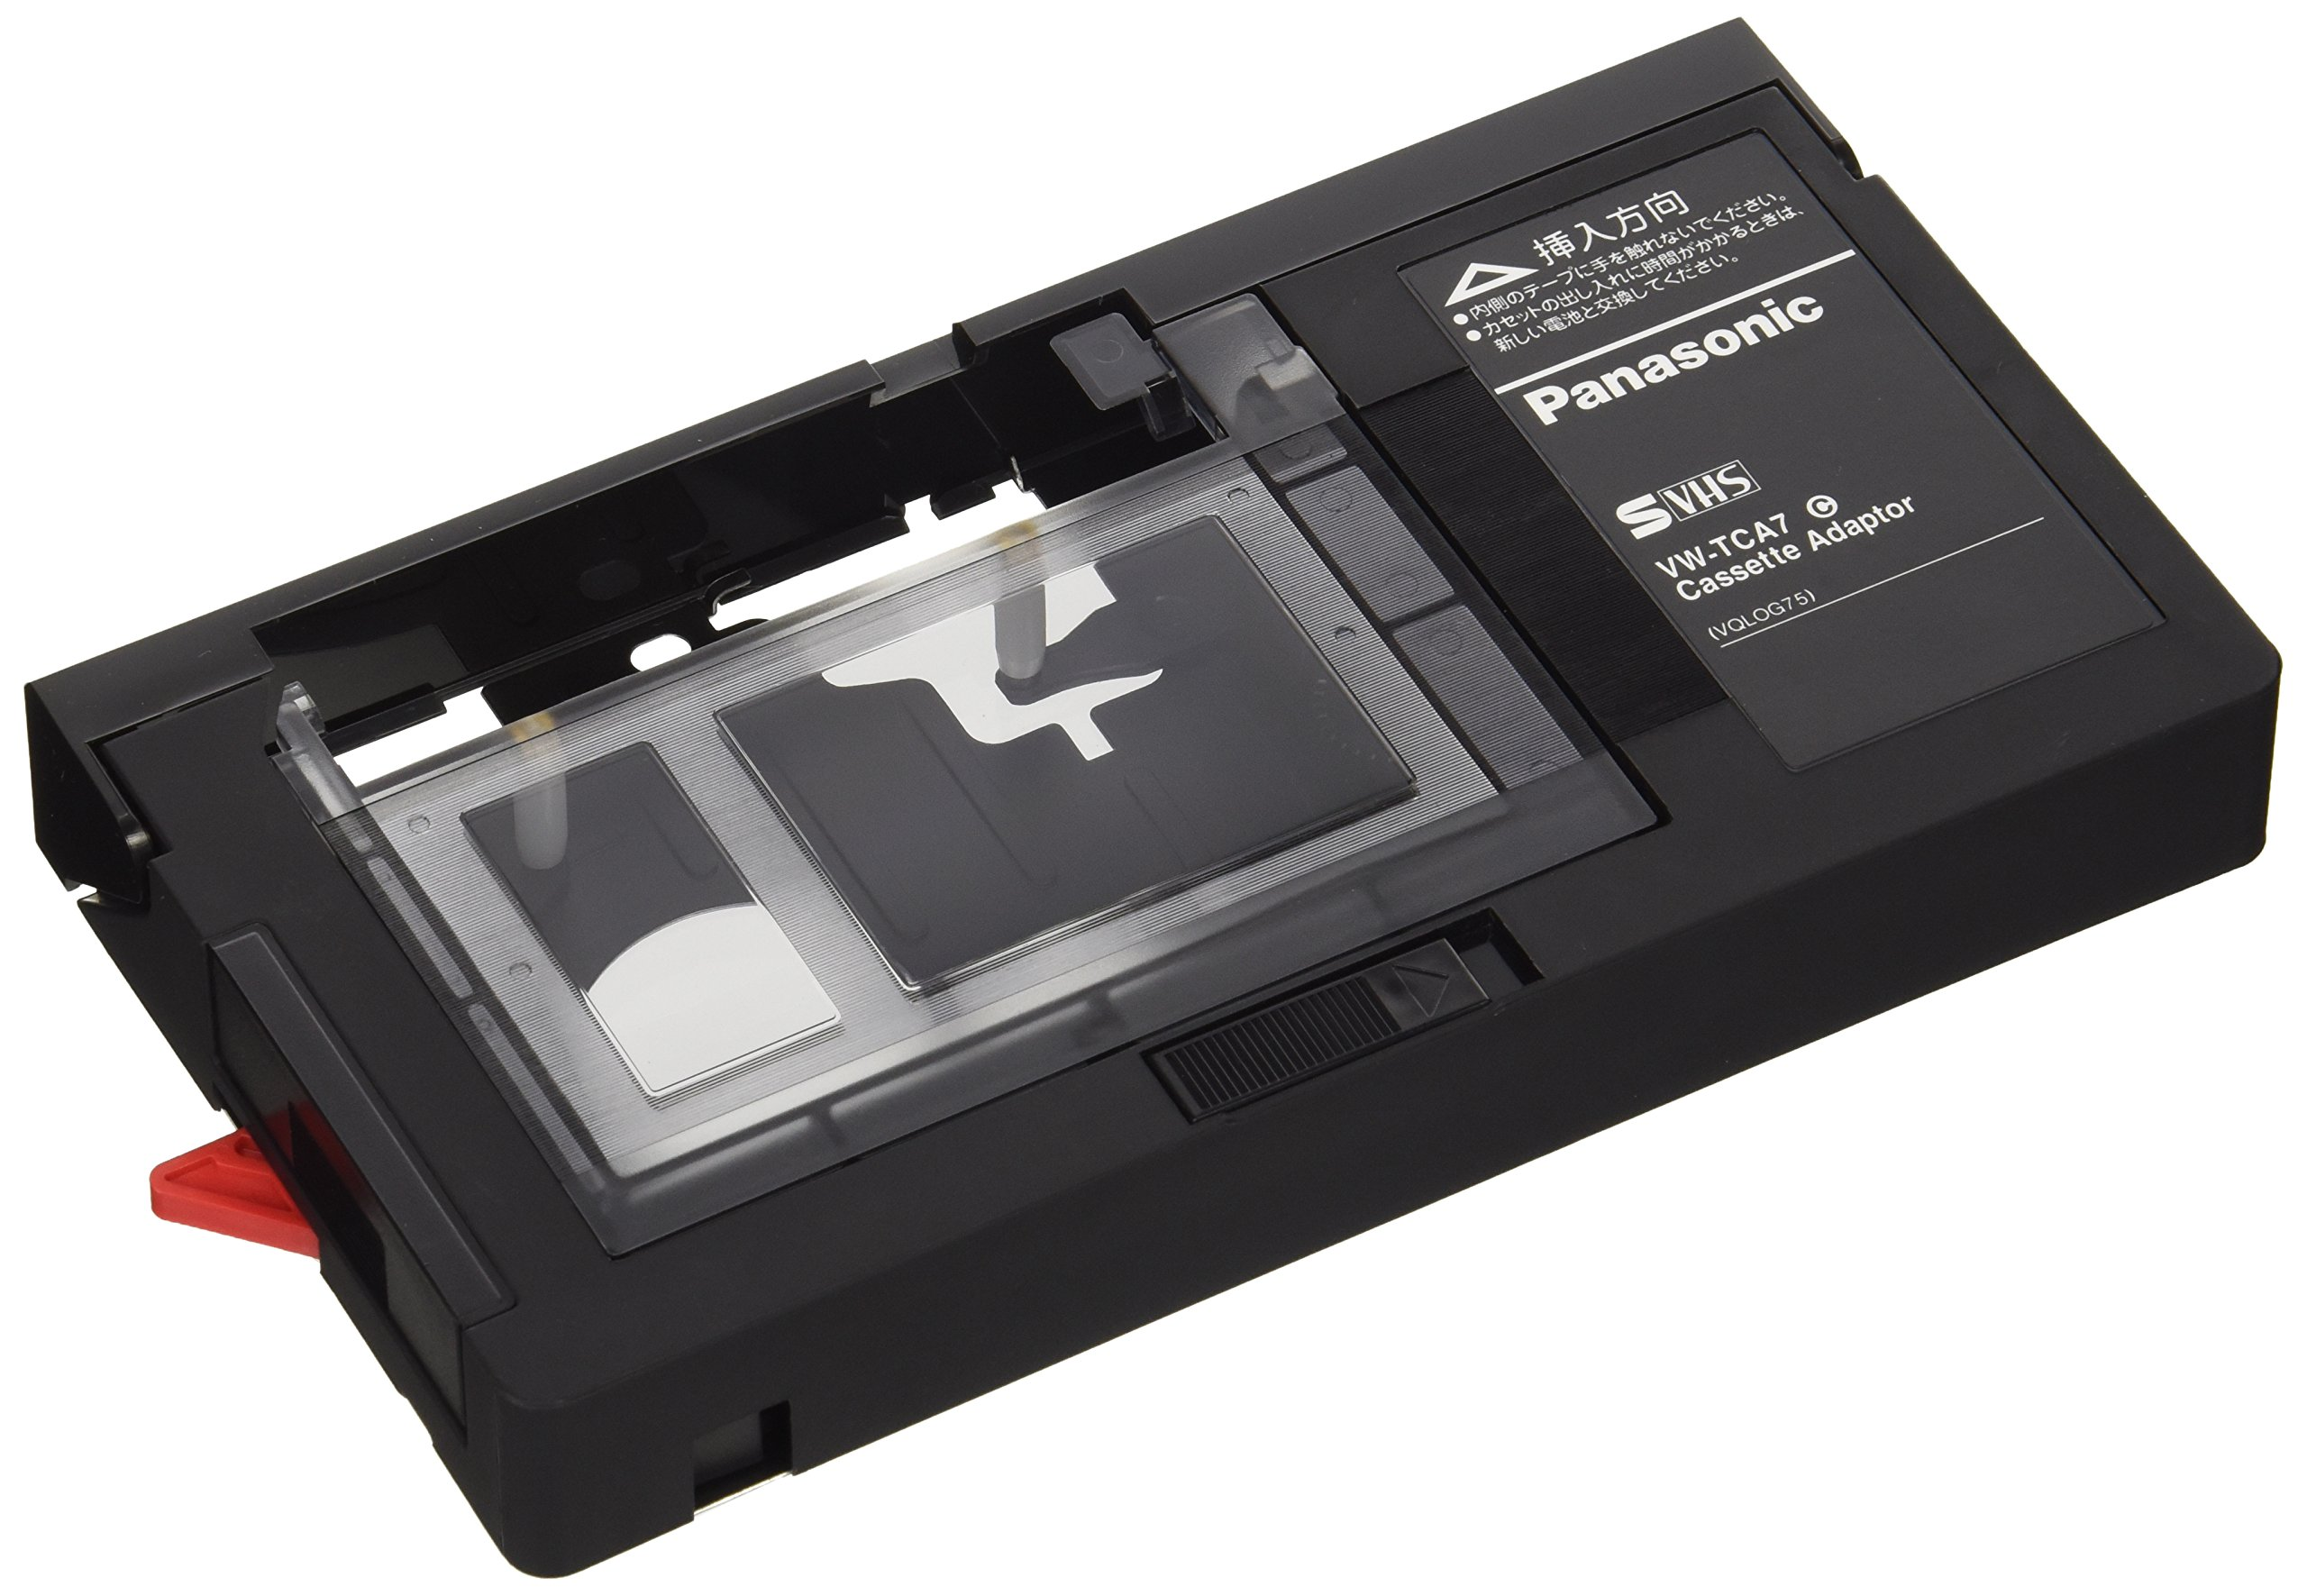 PANASONIC VHS Cassette Adapter VW-TCA7 from Japan - International Version (No Warranty)